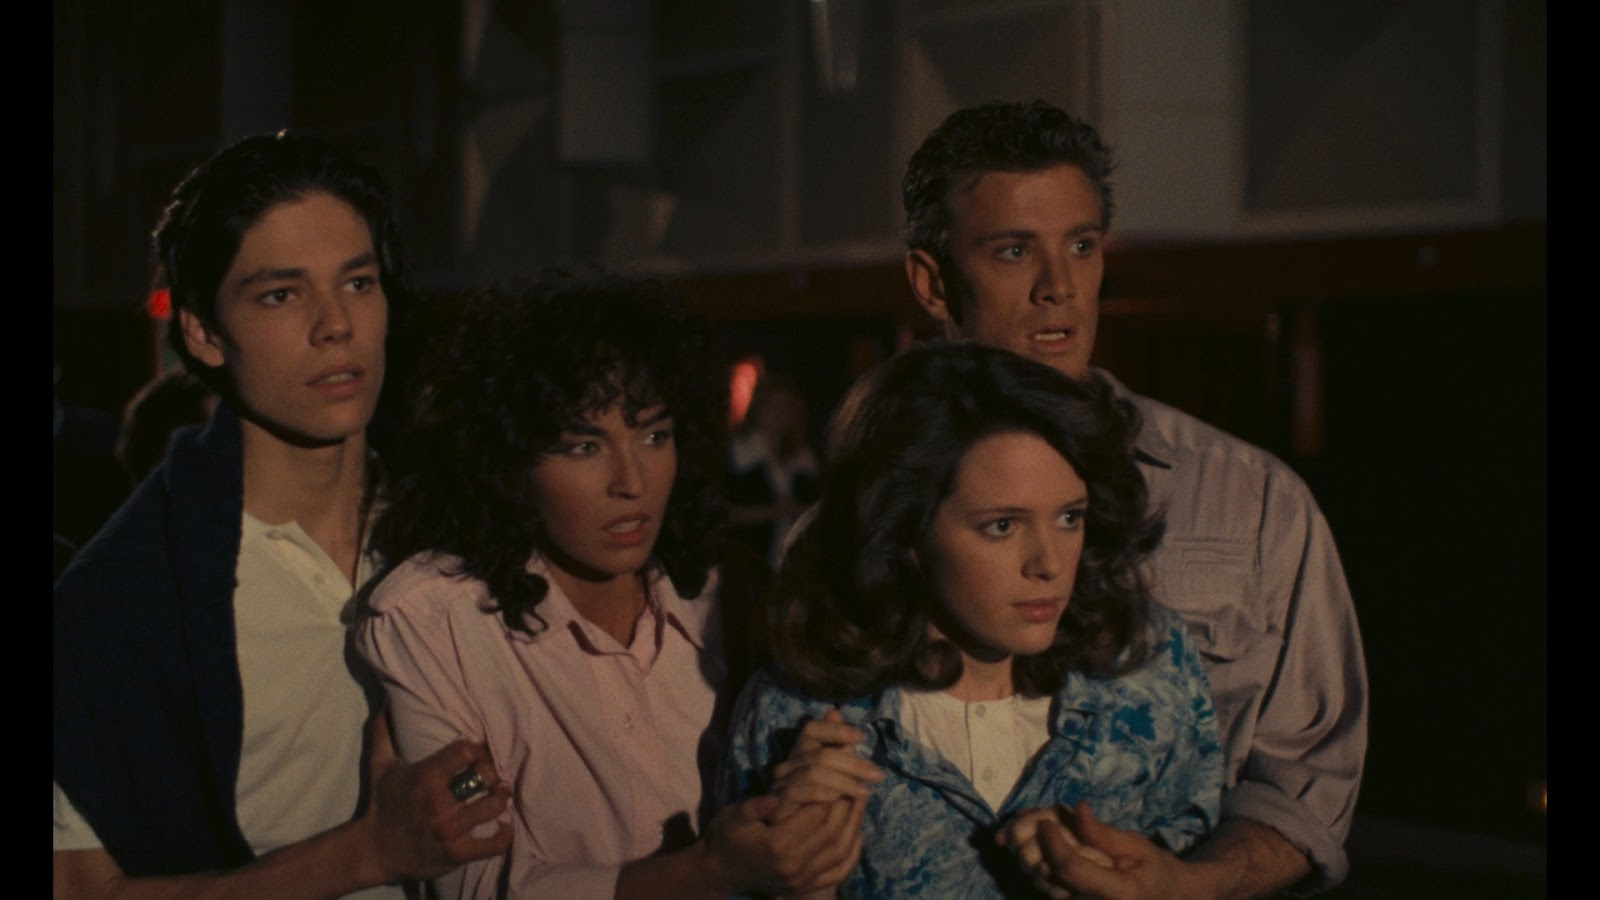 Pearce S Horror Movie Reviews Demons 1985